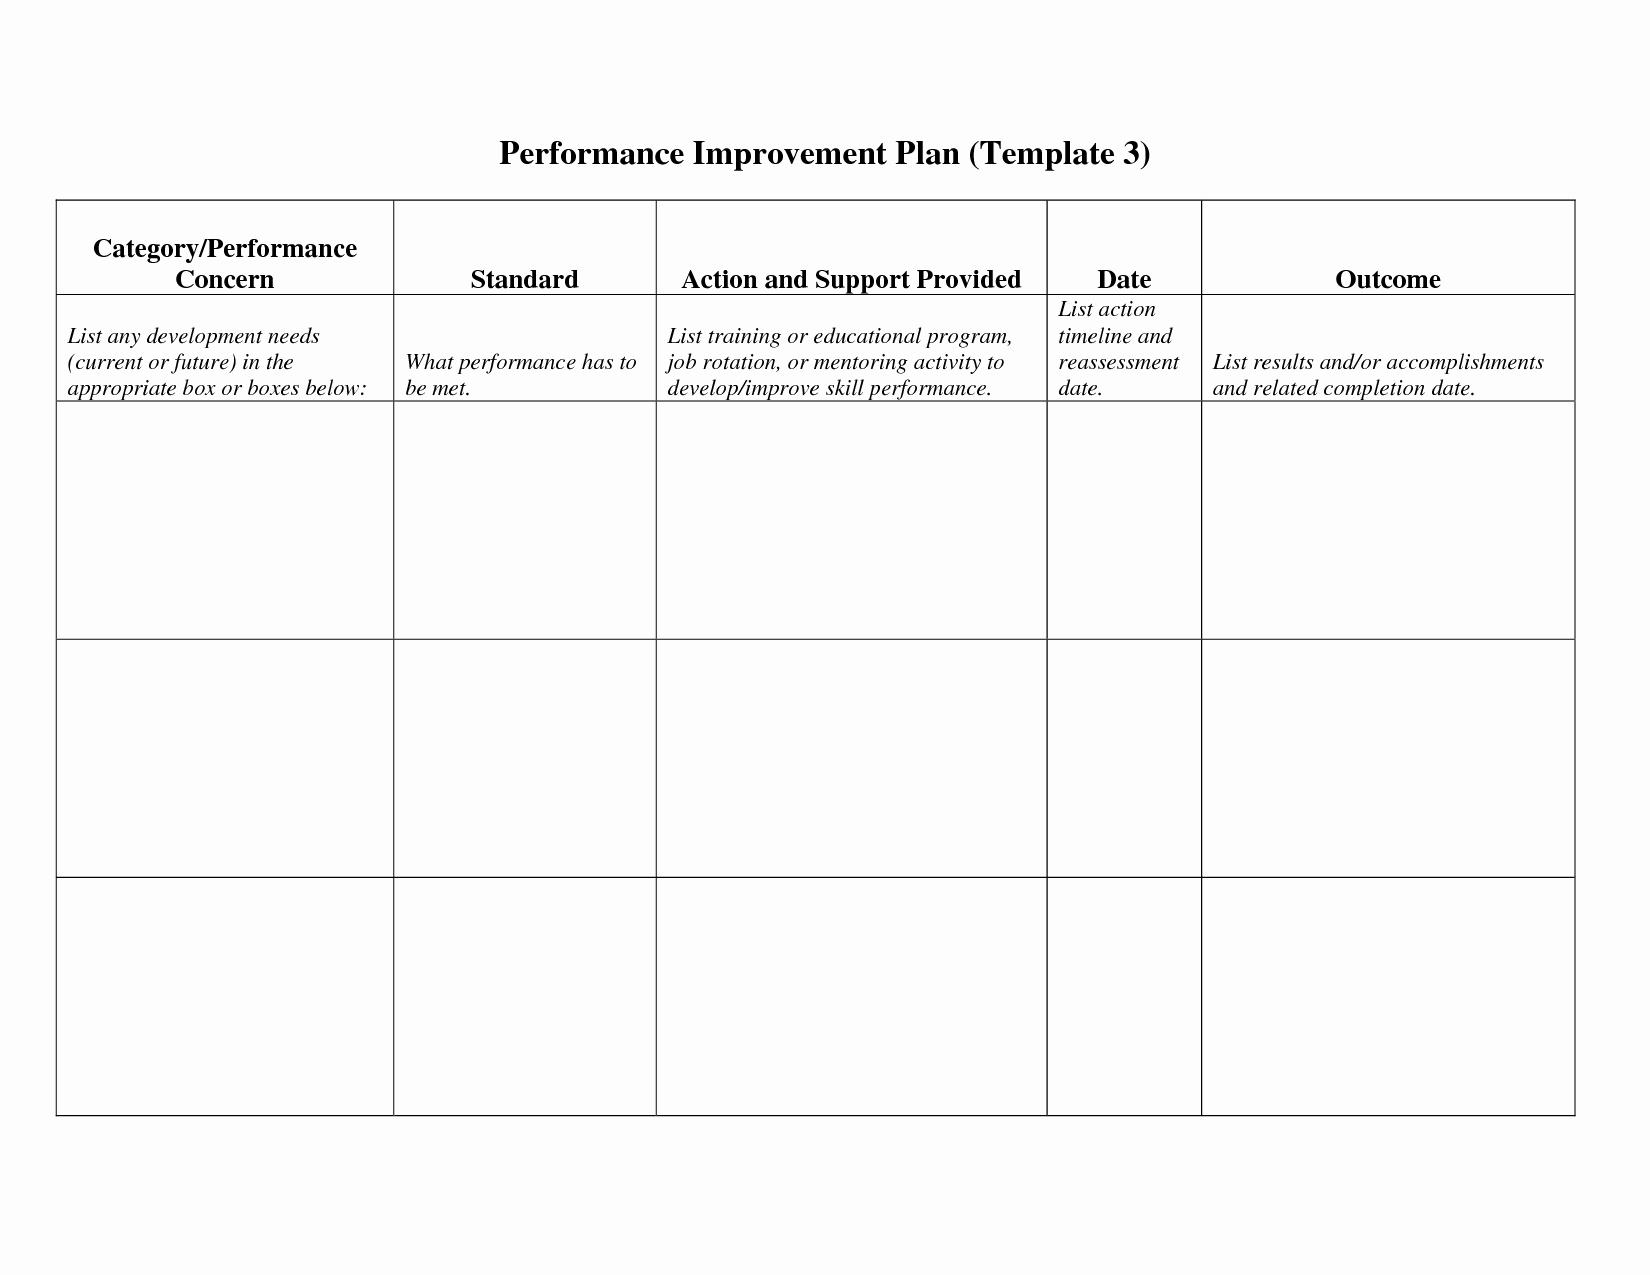 Performance Development Plan Template Elegant Exceptional Performance Plan Template Tinypetition